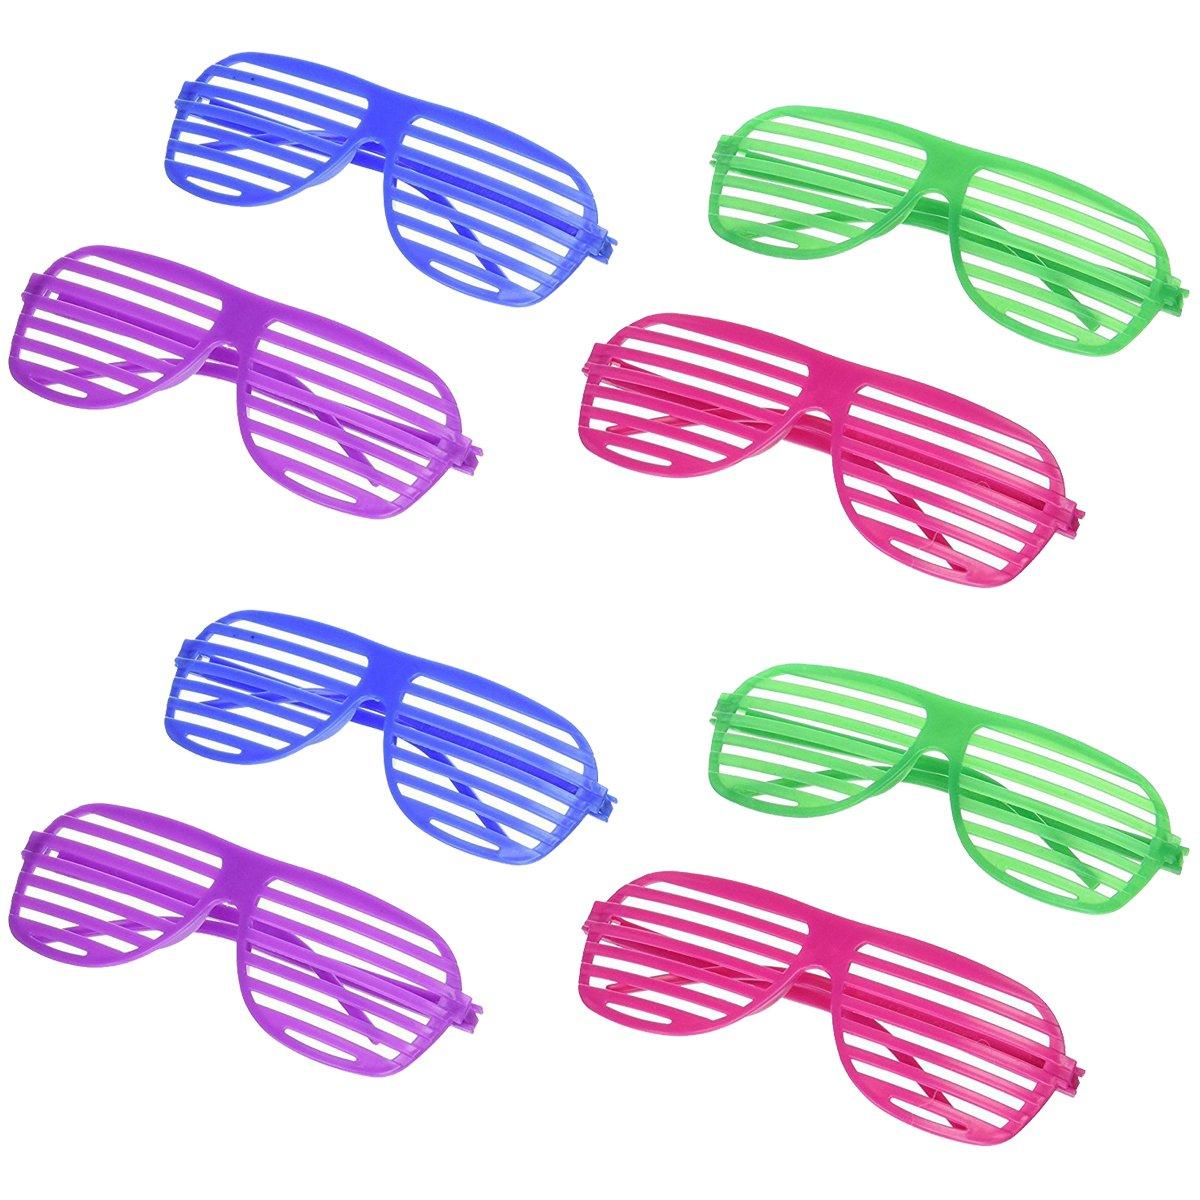 5b7b572336 Amazon.com  Oriental Trading Shutter Shading Glasses (12-Pair)  Toys   Games